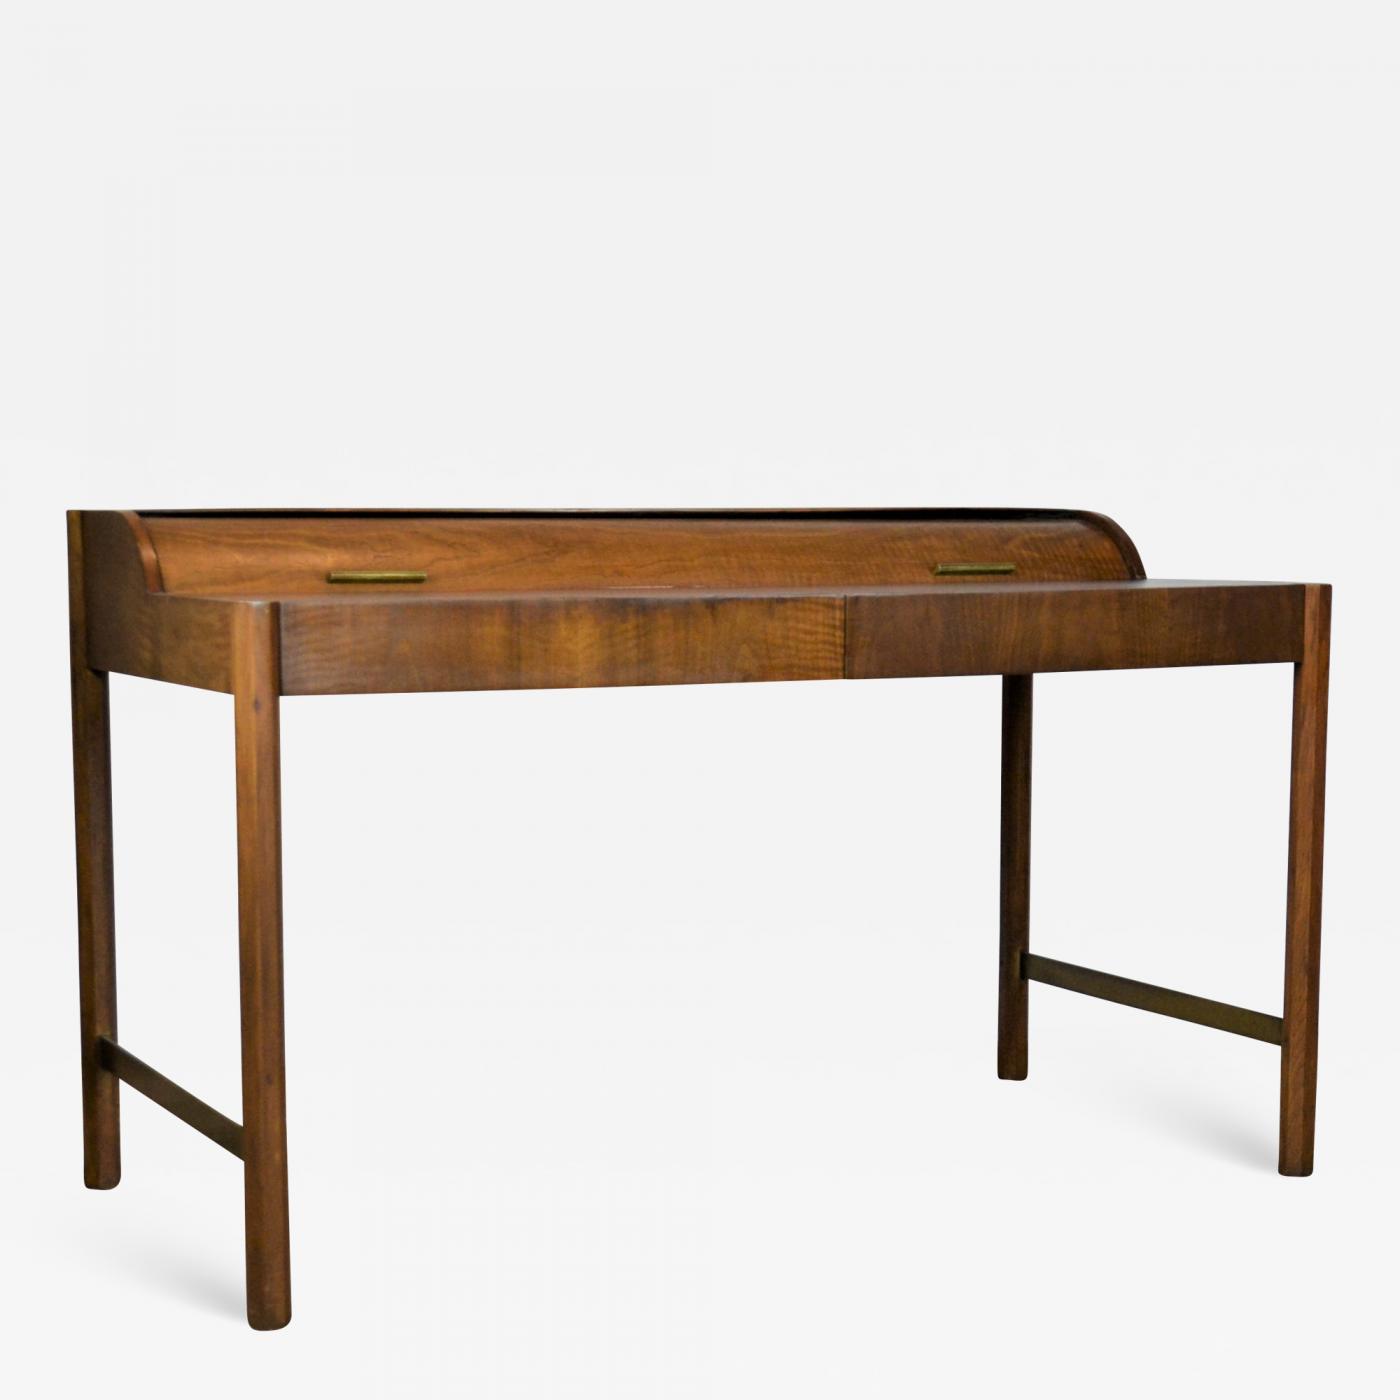 Image of: Hekman Furniture Company Mid Century Desk By Hekman